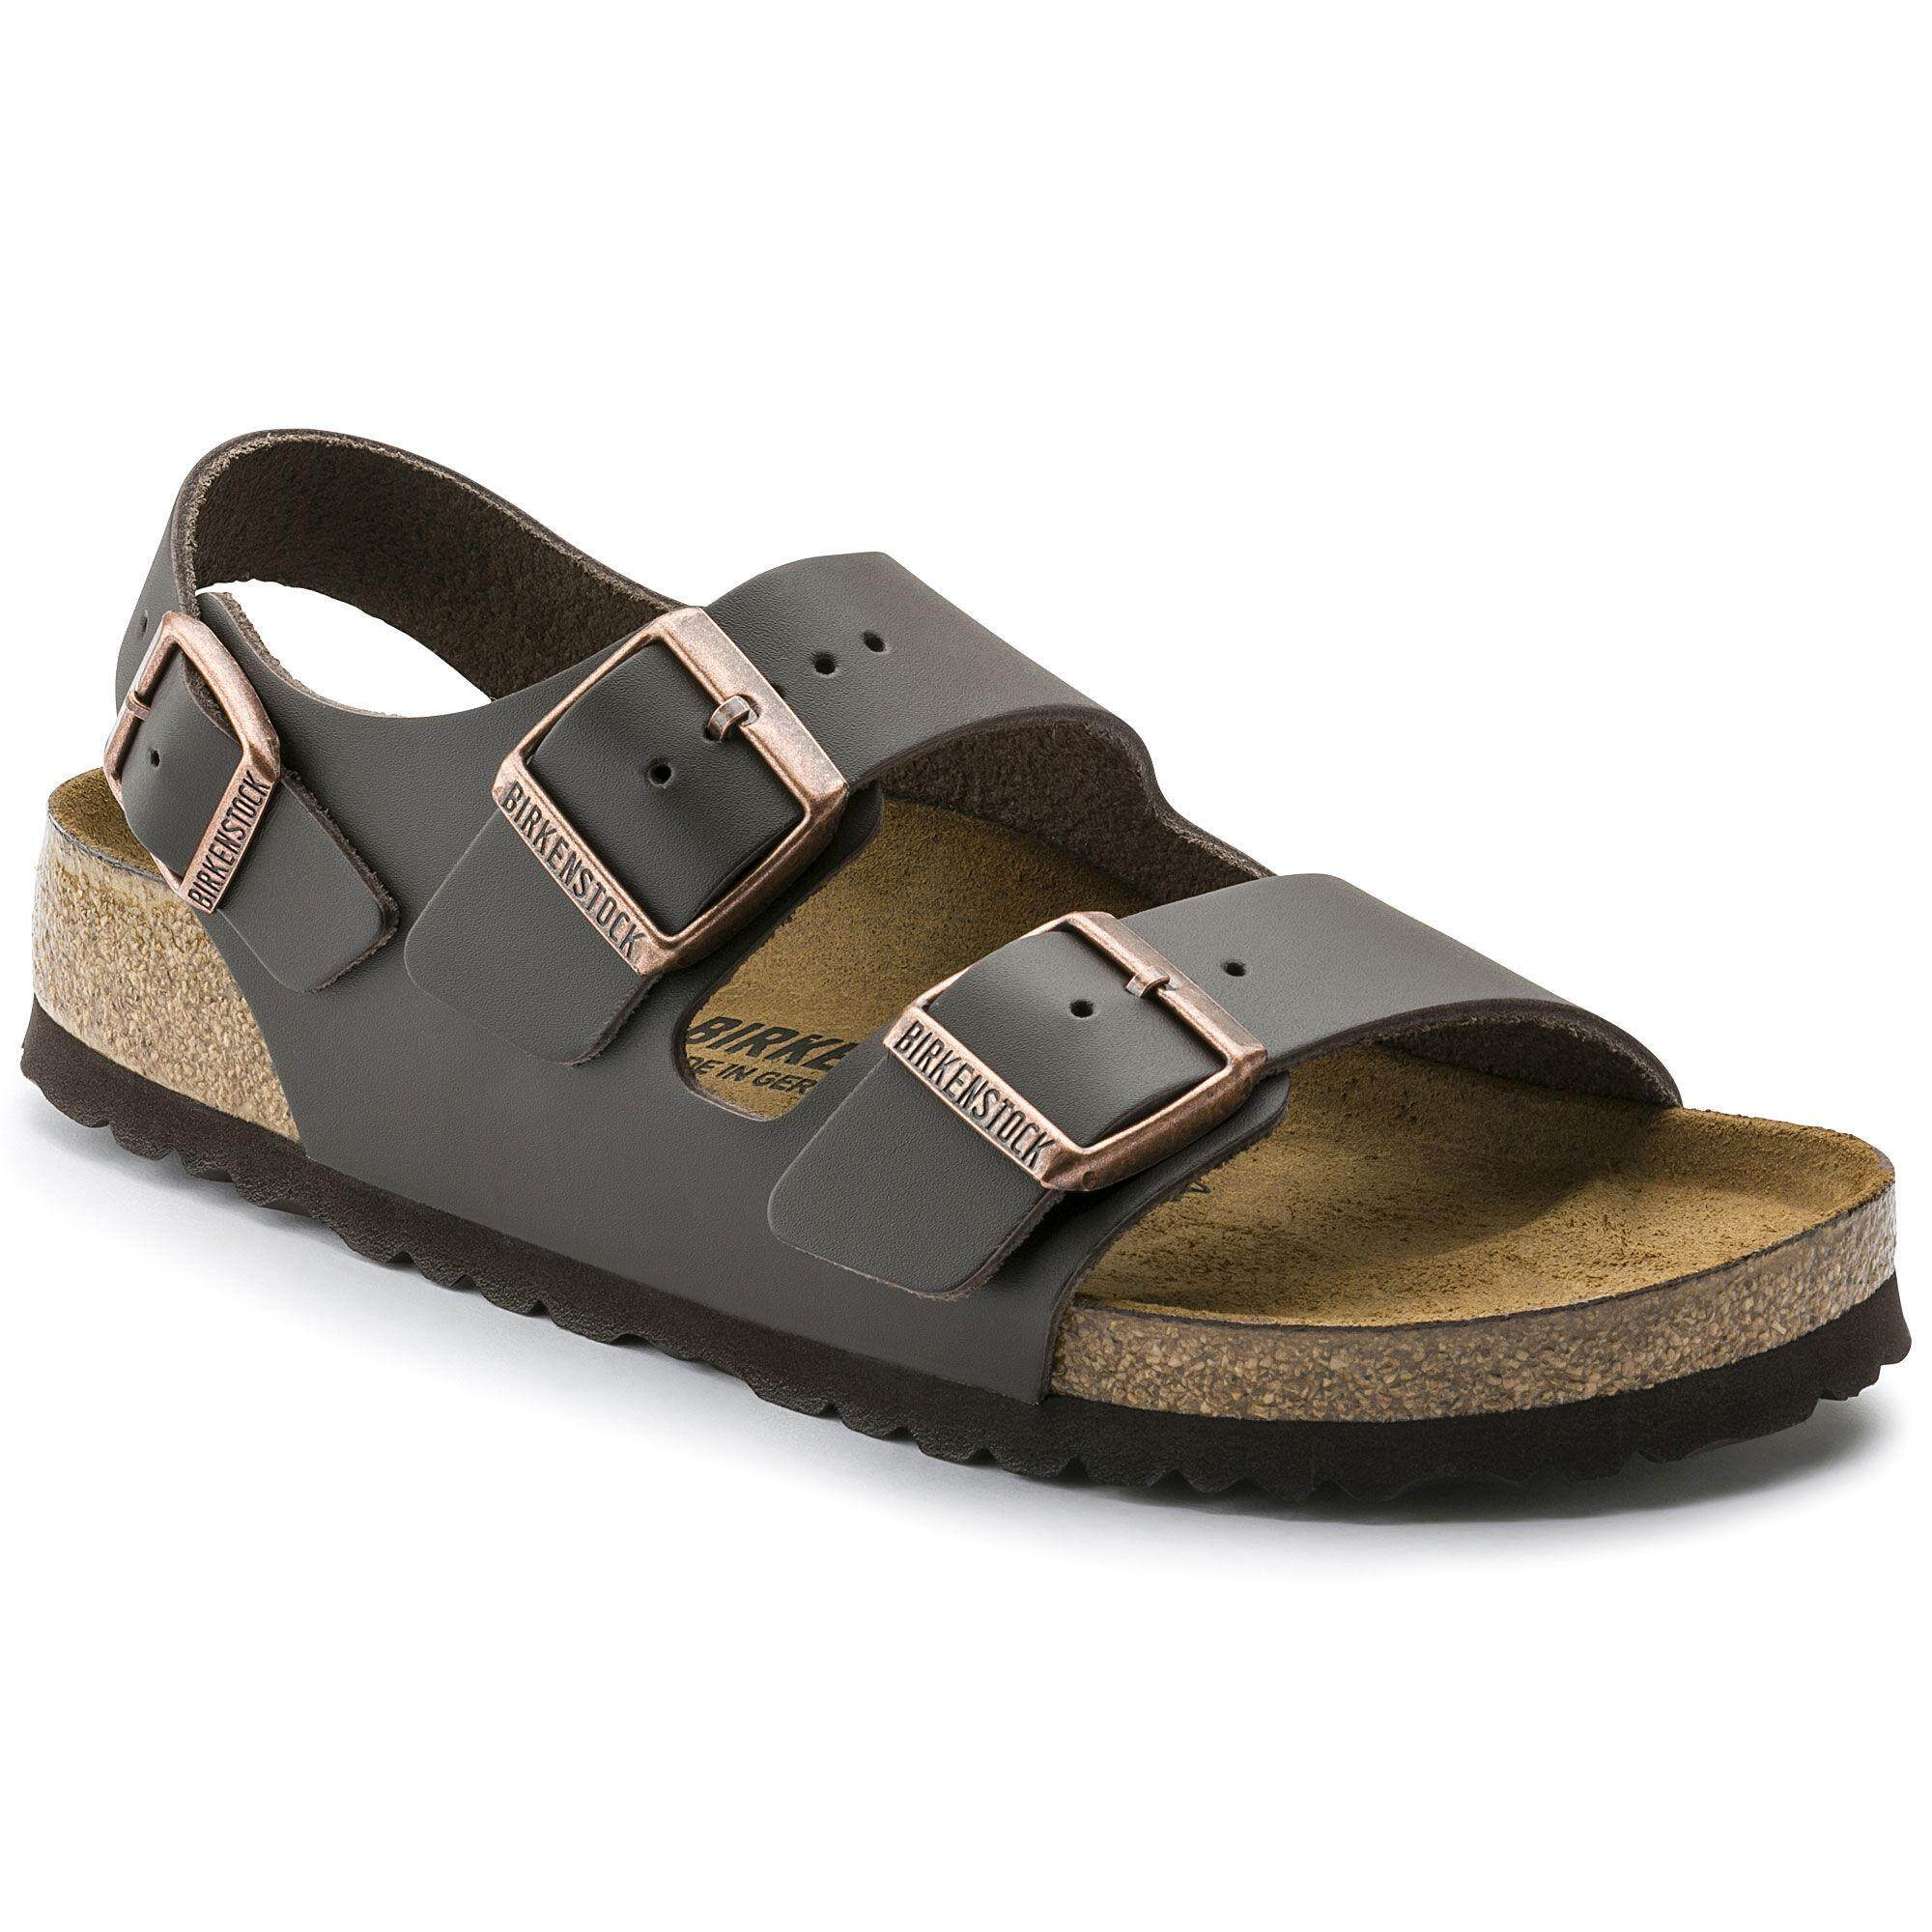 cb6f9afea922 Birkenstocks Women Sandals Women Back Ankle-Strap Milano Natural Leather  Dark Brown